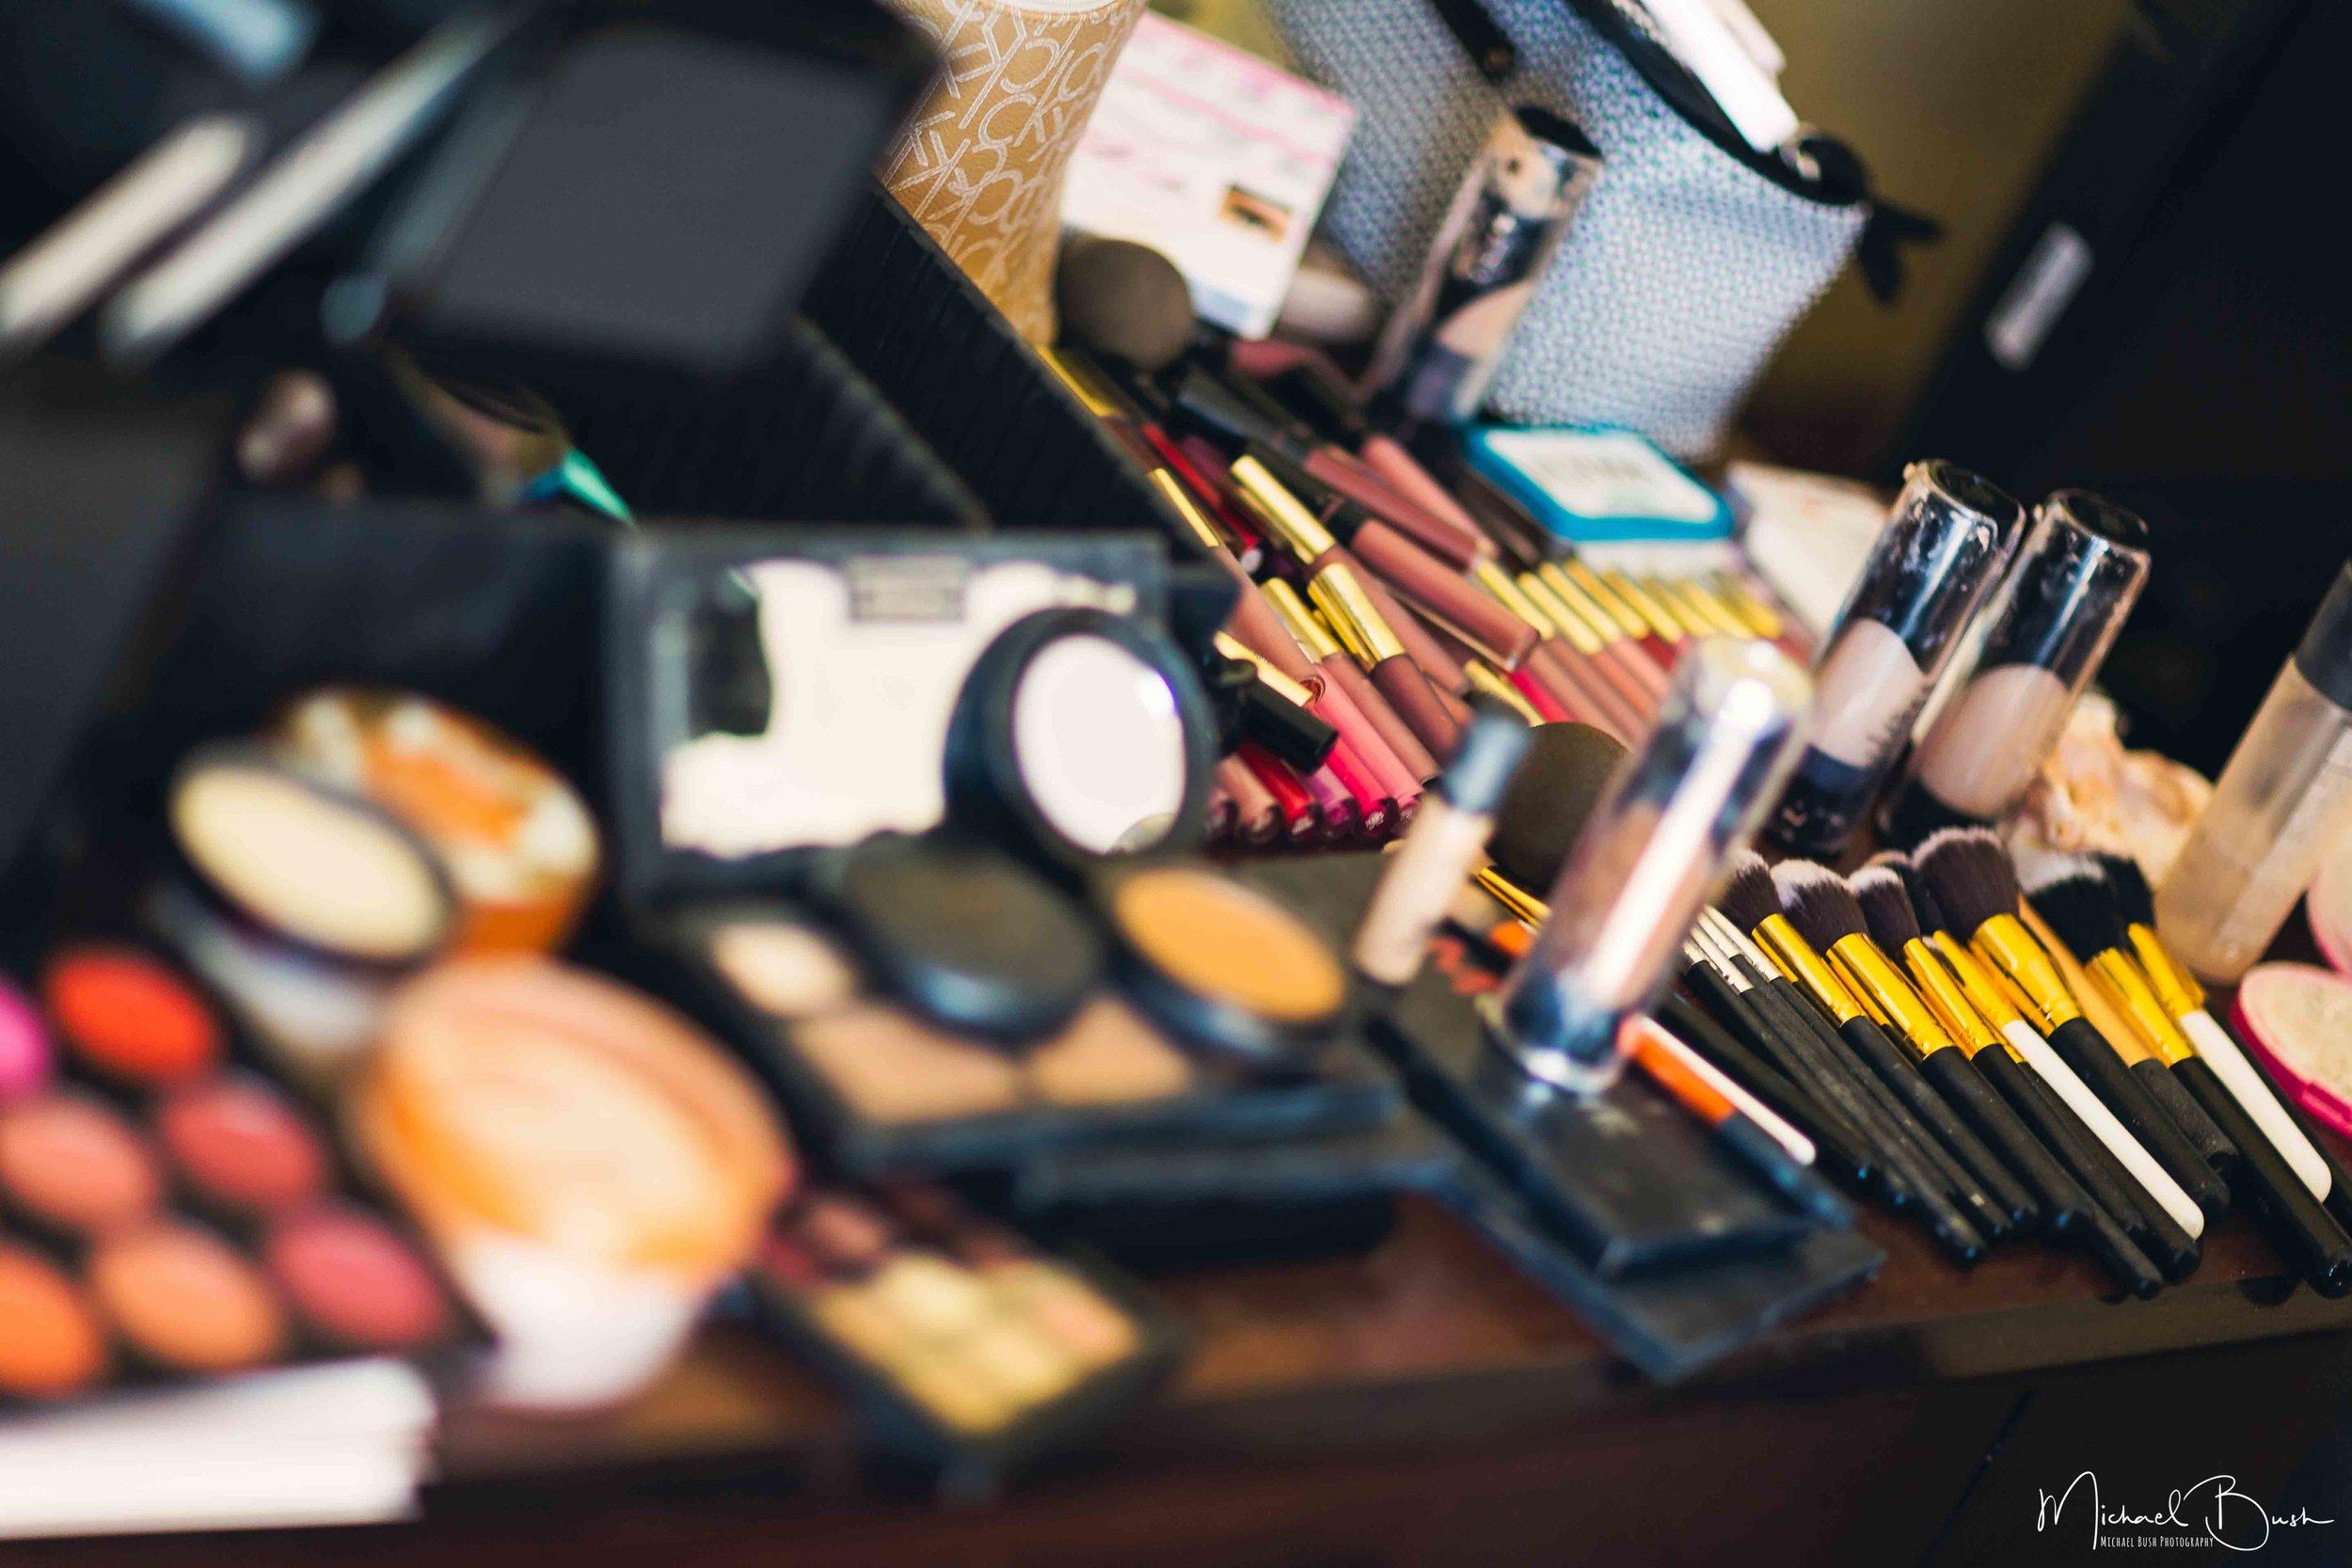 Wedding-Details-Bride-Fort Worth-colors-Getting Ready-MUA-brides-brushes.jpg